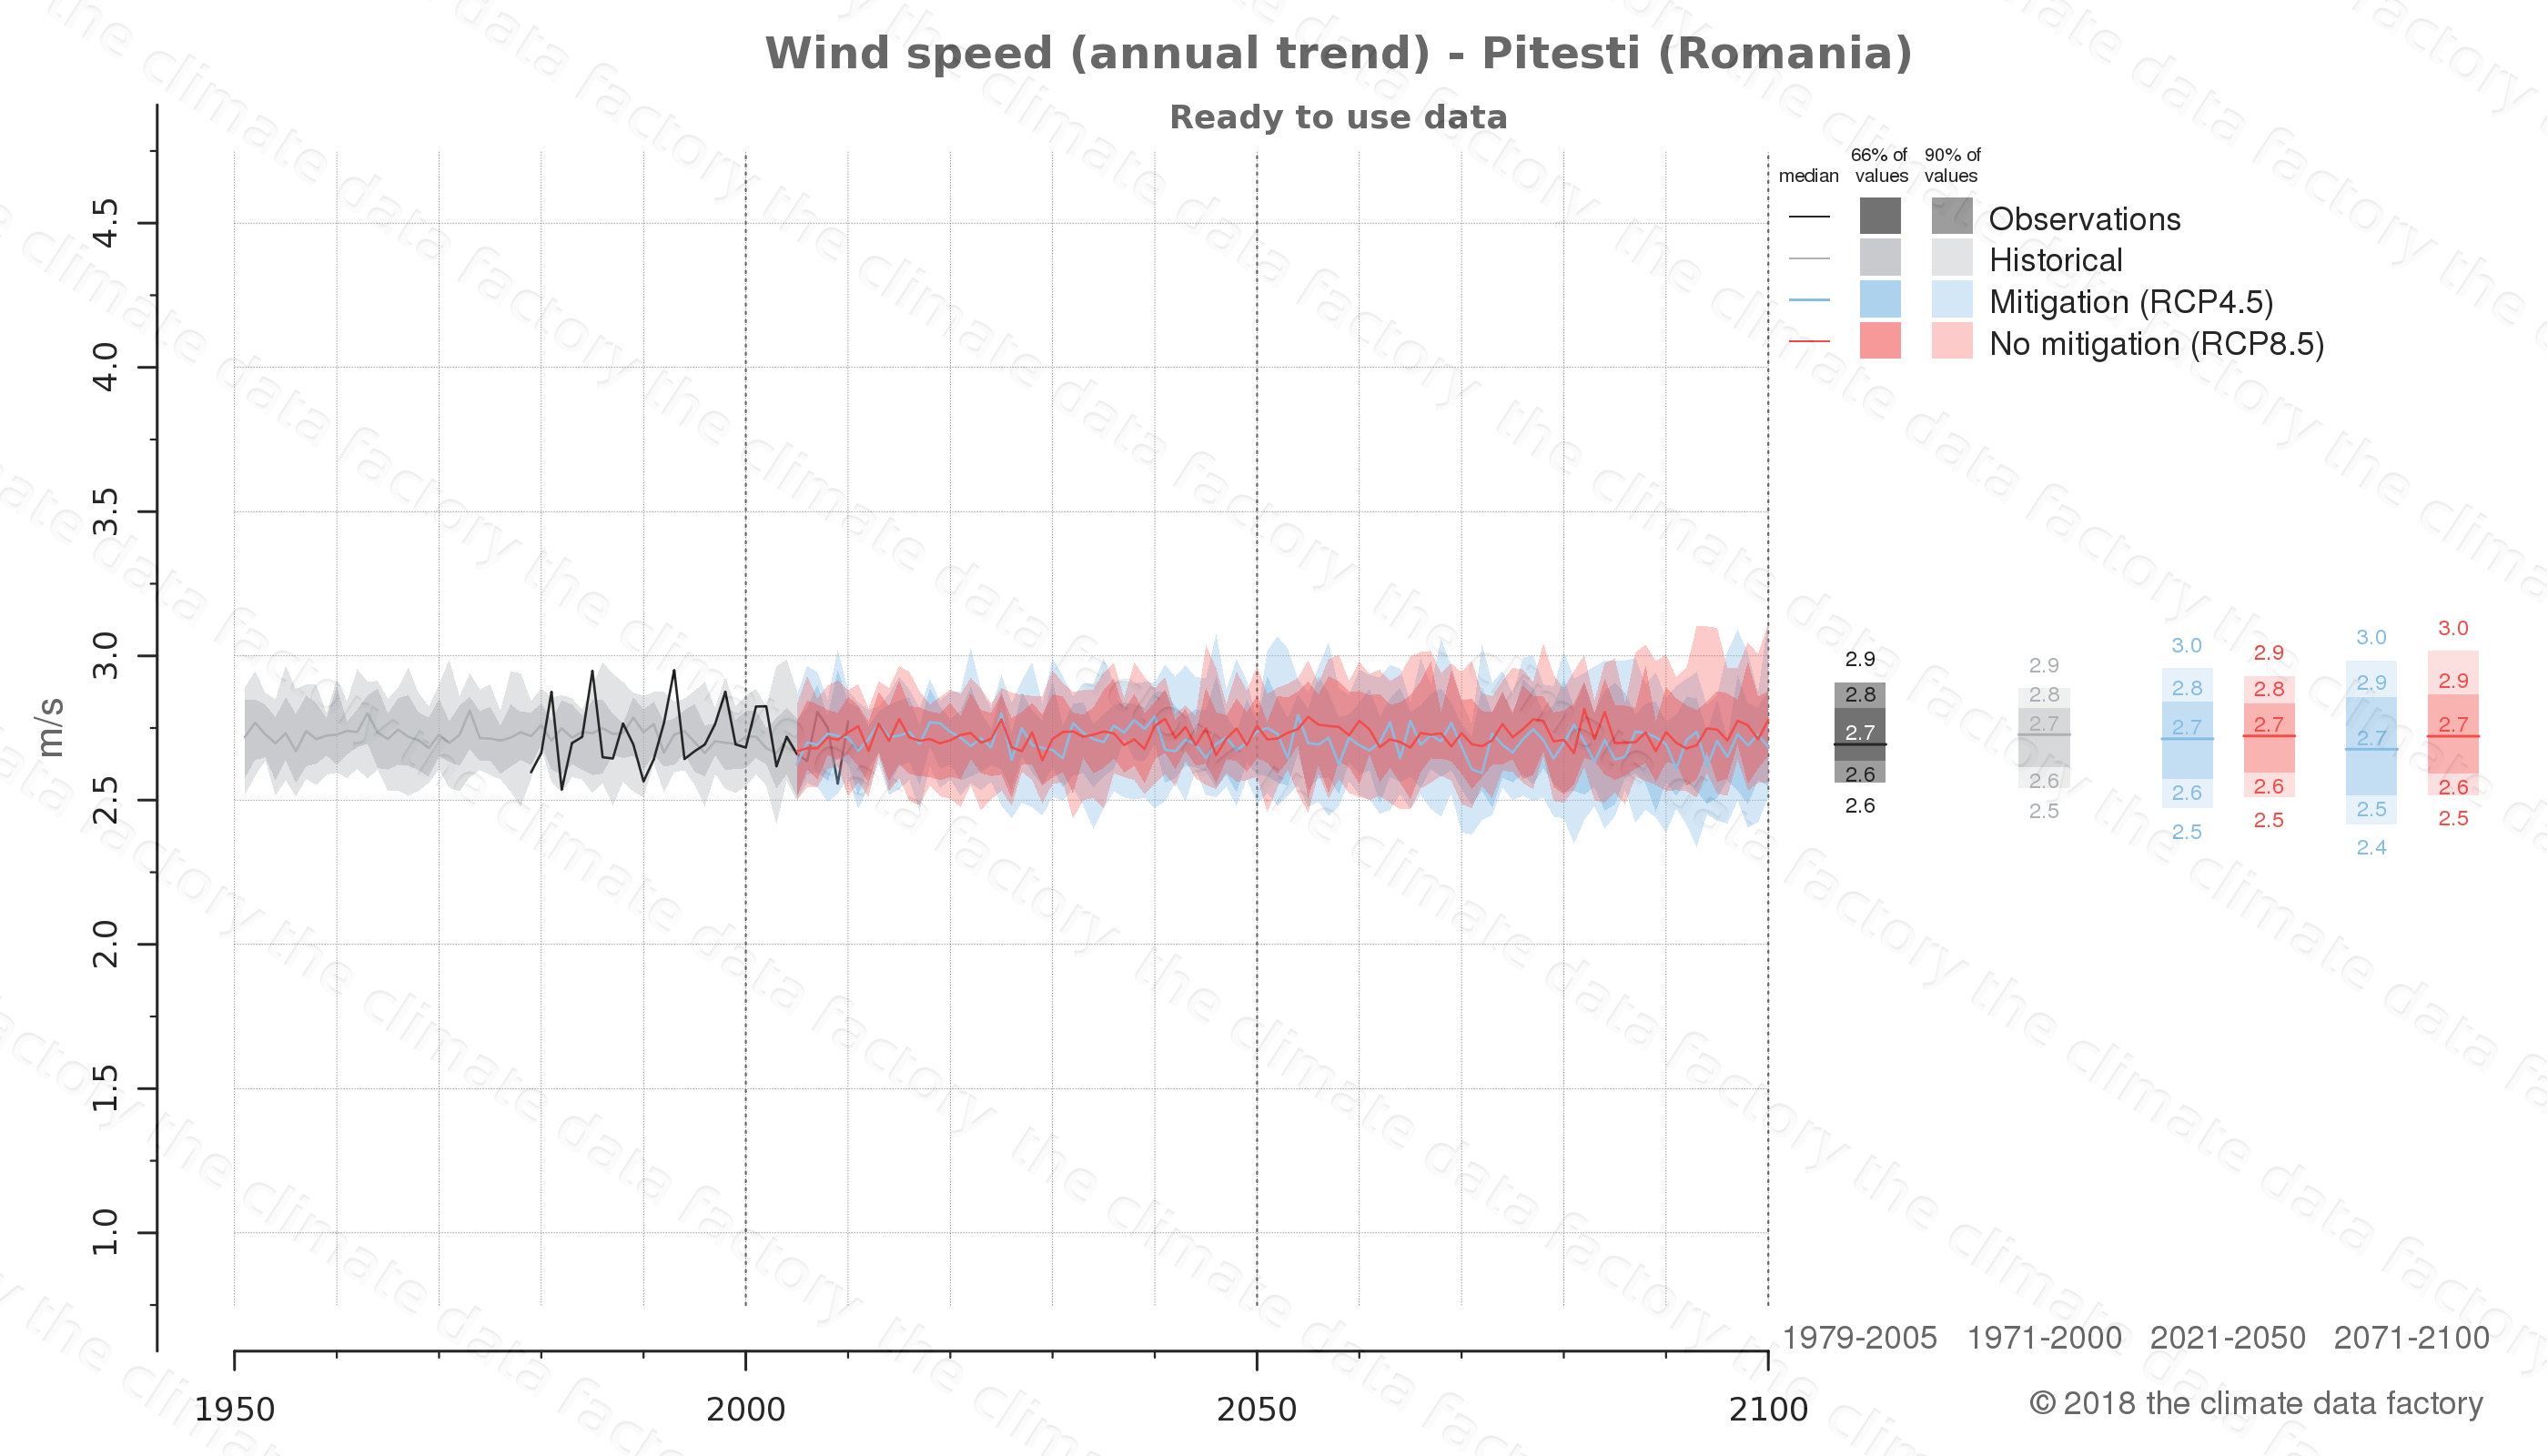 climate change data policy adaptation climate graph city data wind-speed pitesti romania